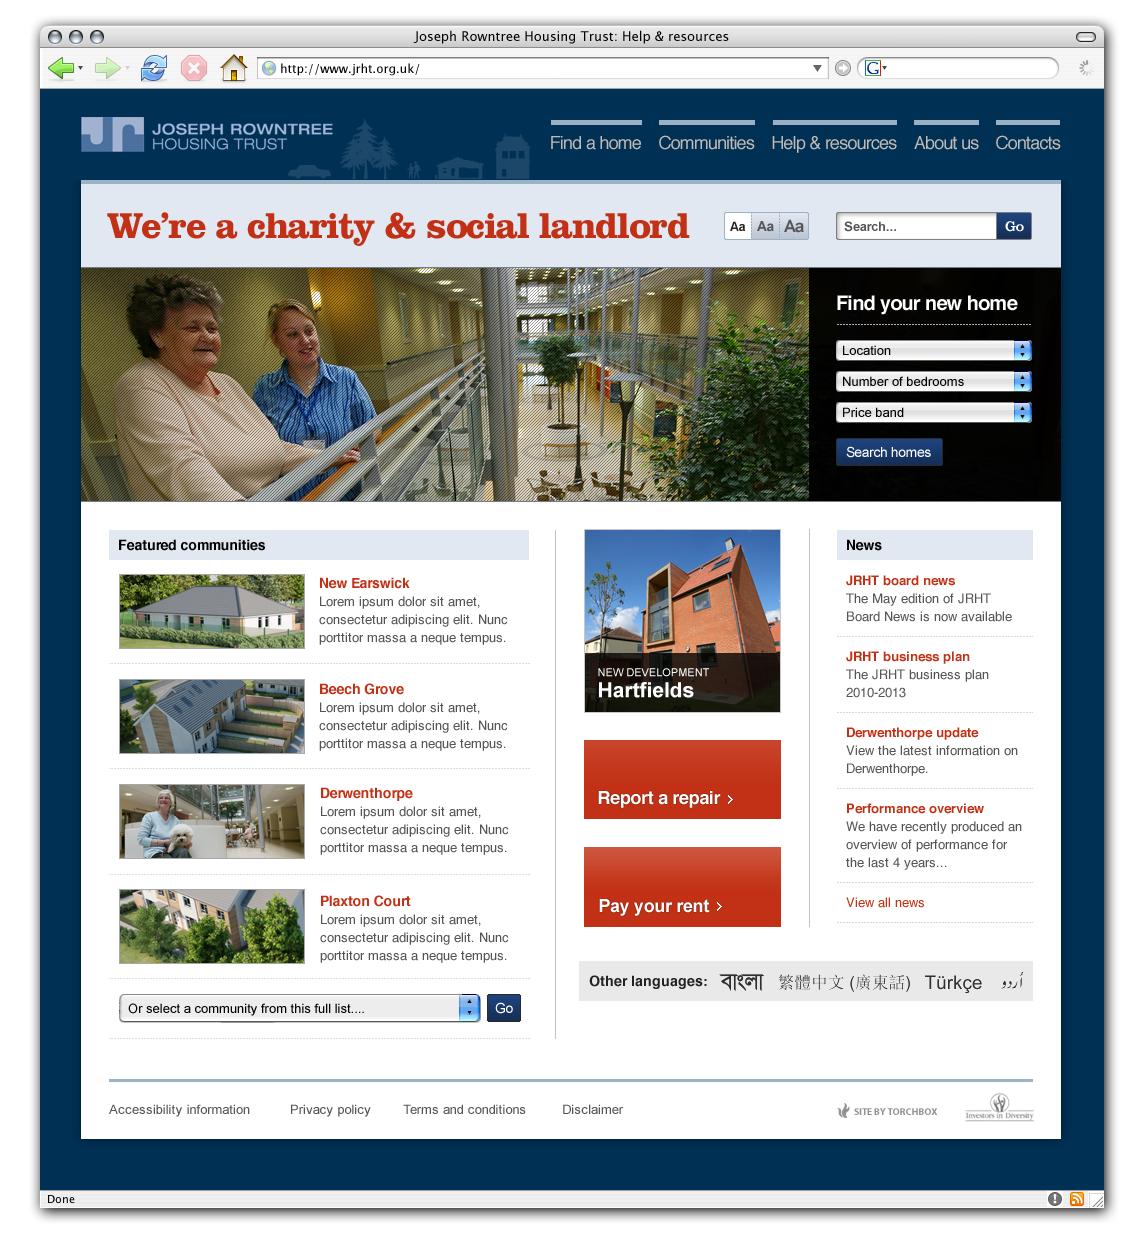 Jrht homepage